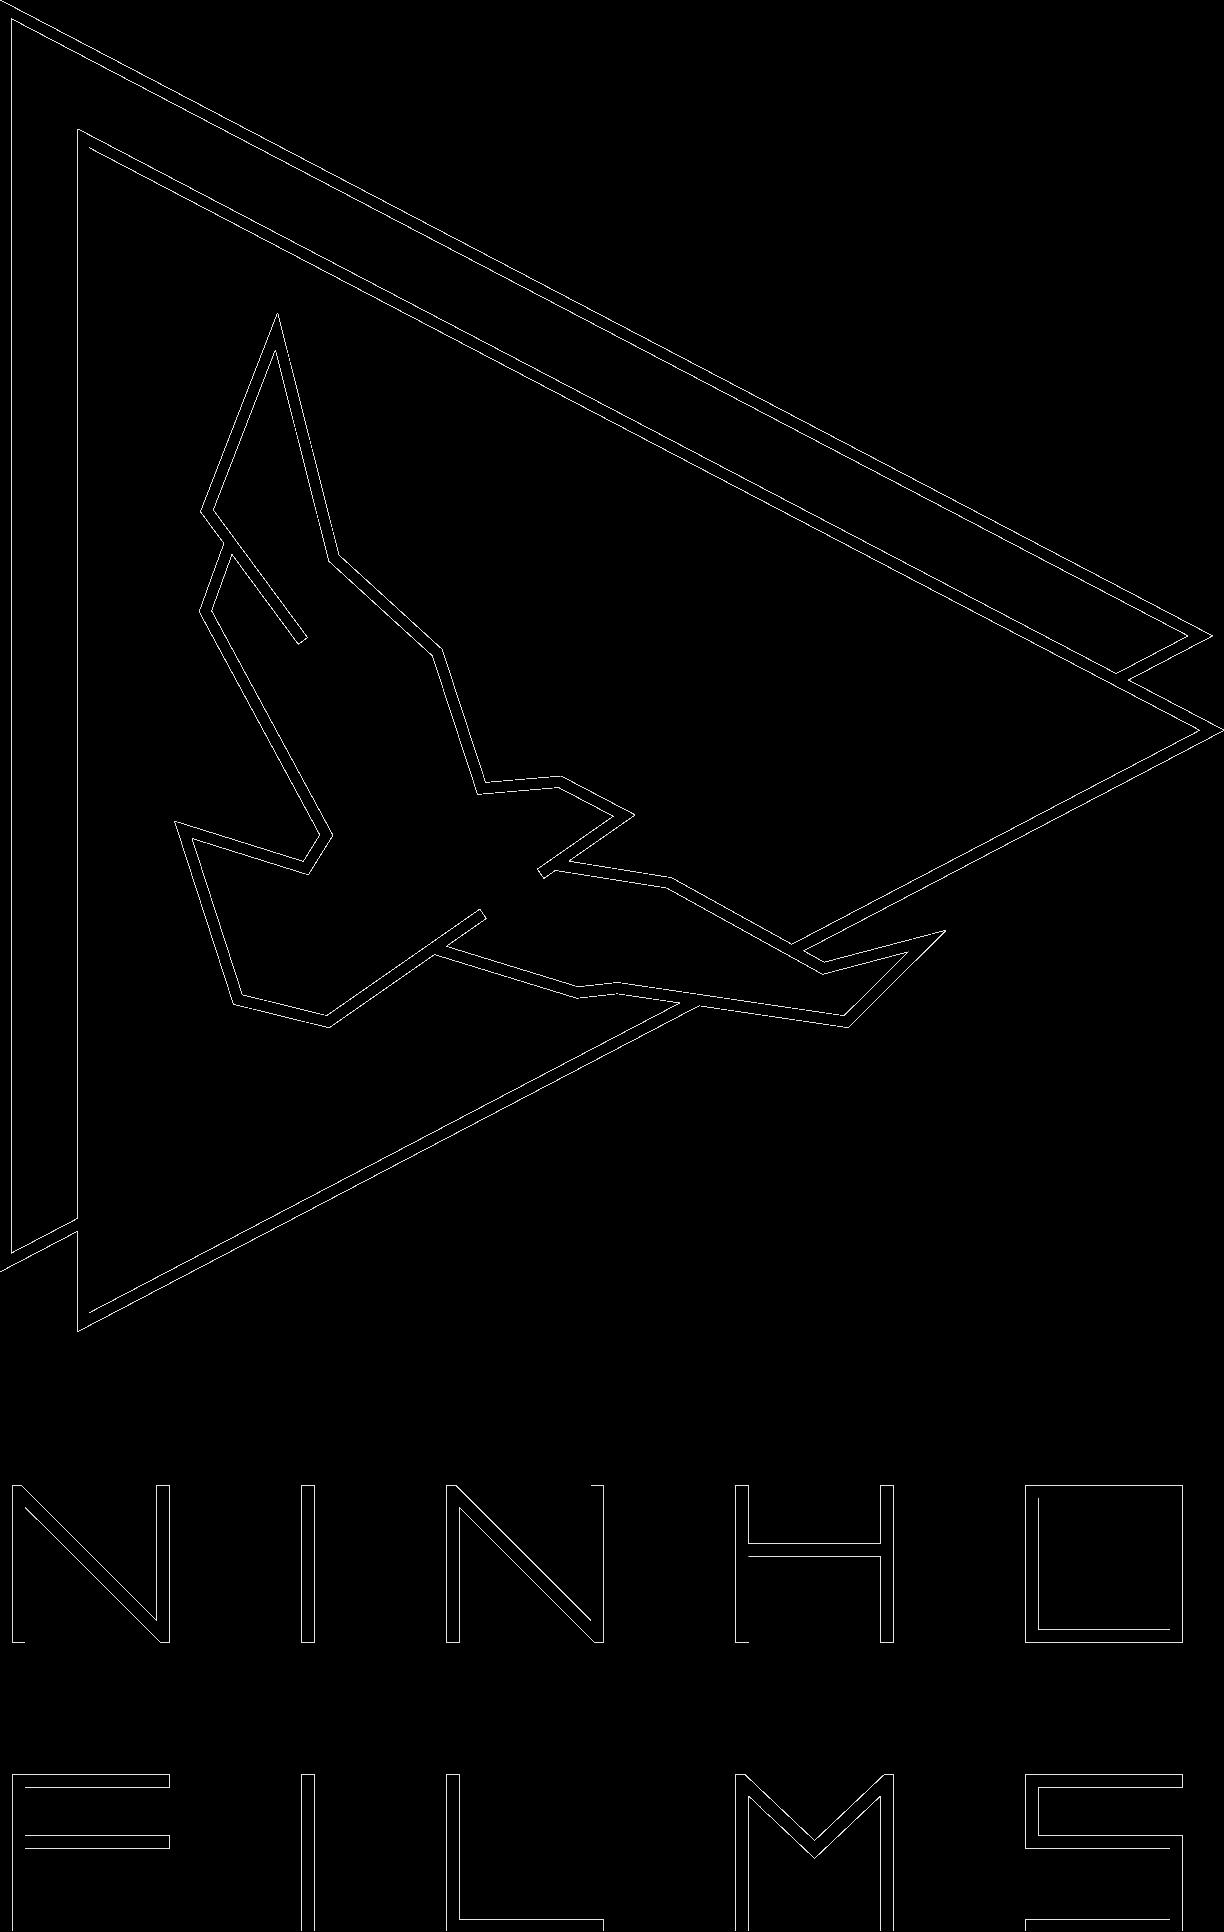 ninhofilms